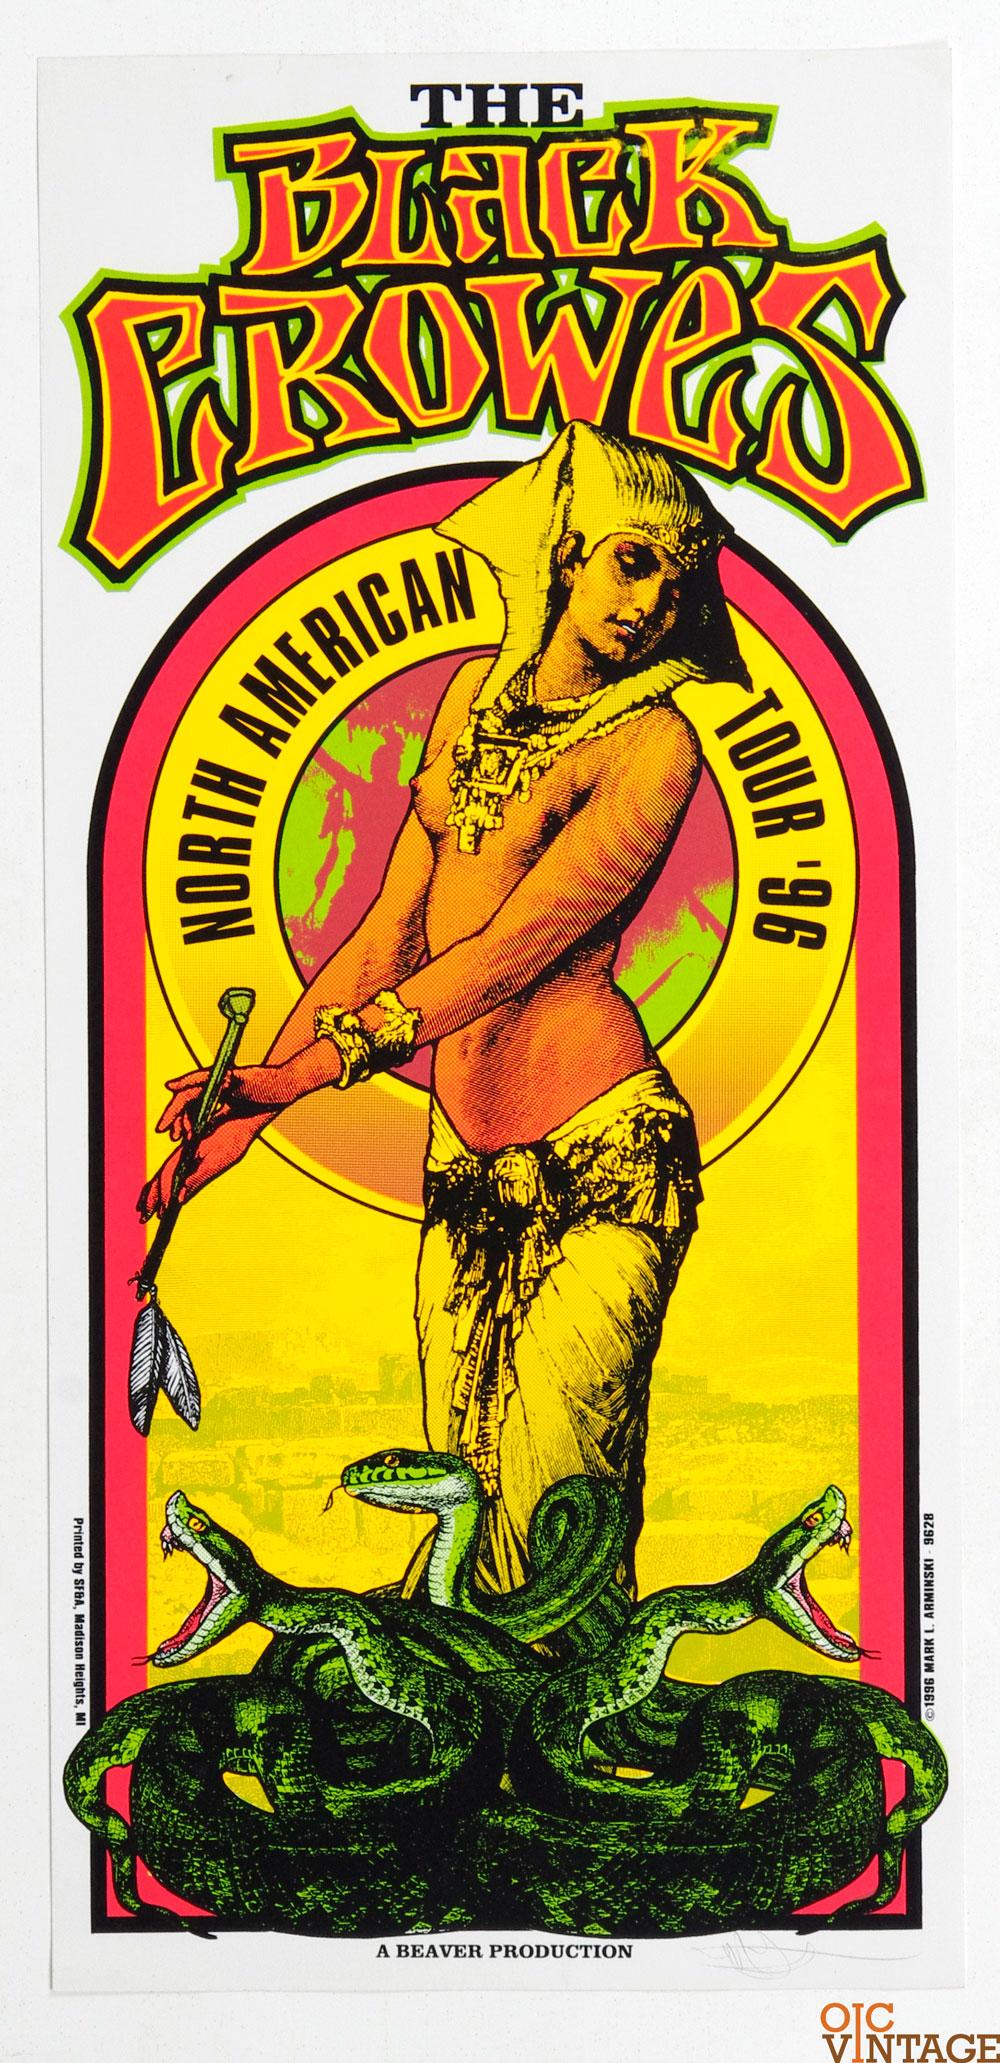 Black Crowes Poster 1996 North American Tour Mark Arminski signed